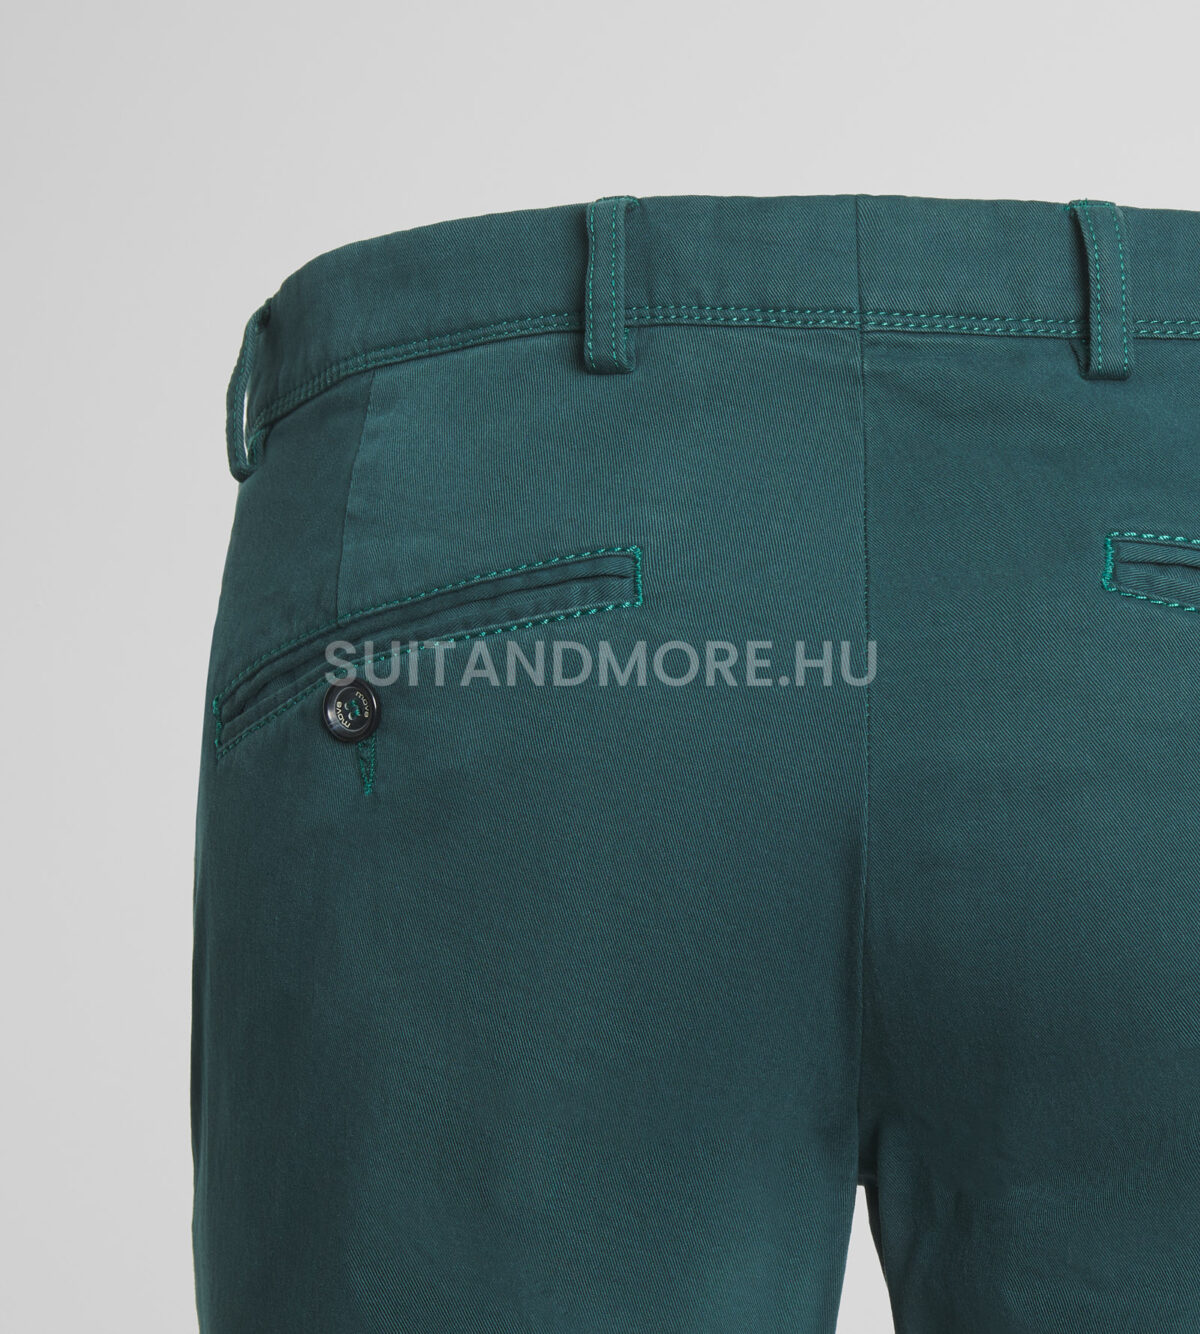 zöld-extra-slim-fit-pamut-sztreccs-chino-nadrág-NIGEL-88160-51-03